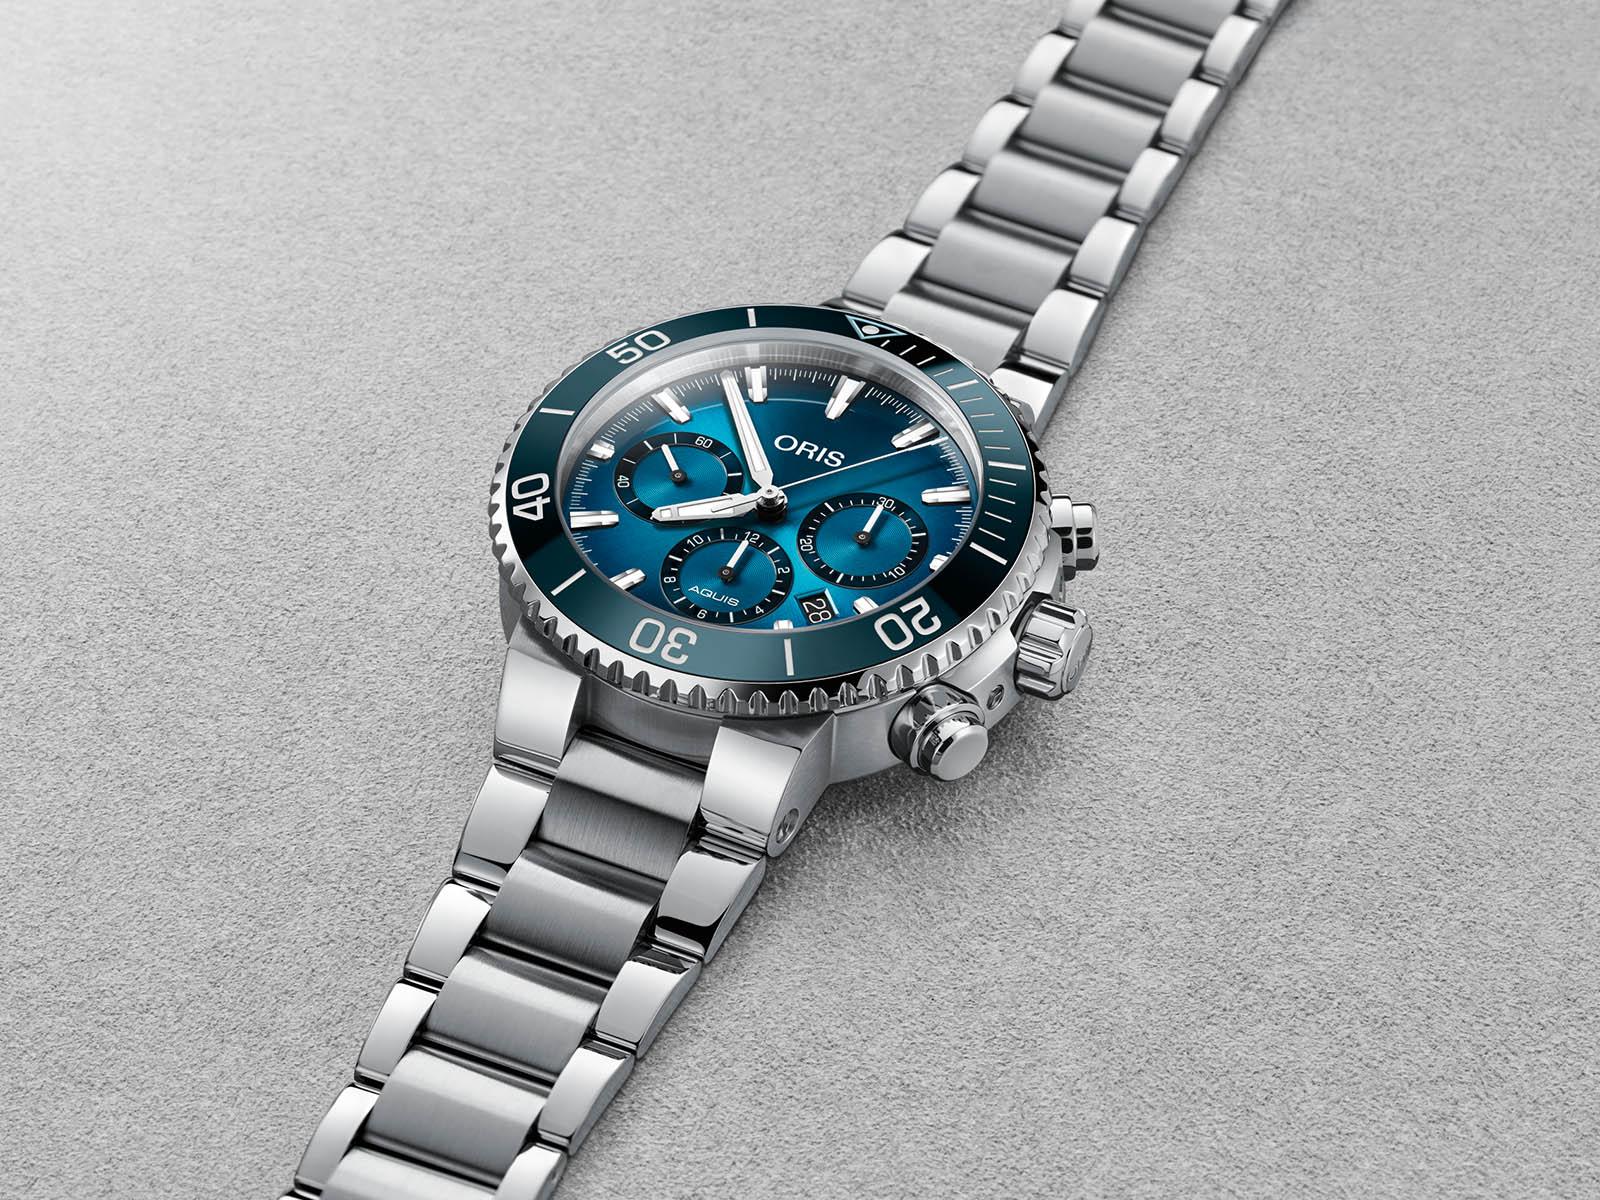 01-771-7743-4185-oris-blue-whale-limited-edition-2.jpg